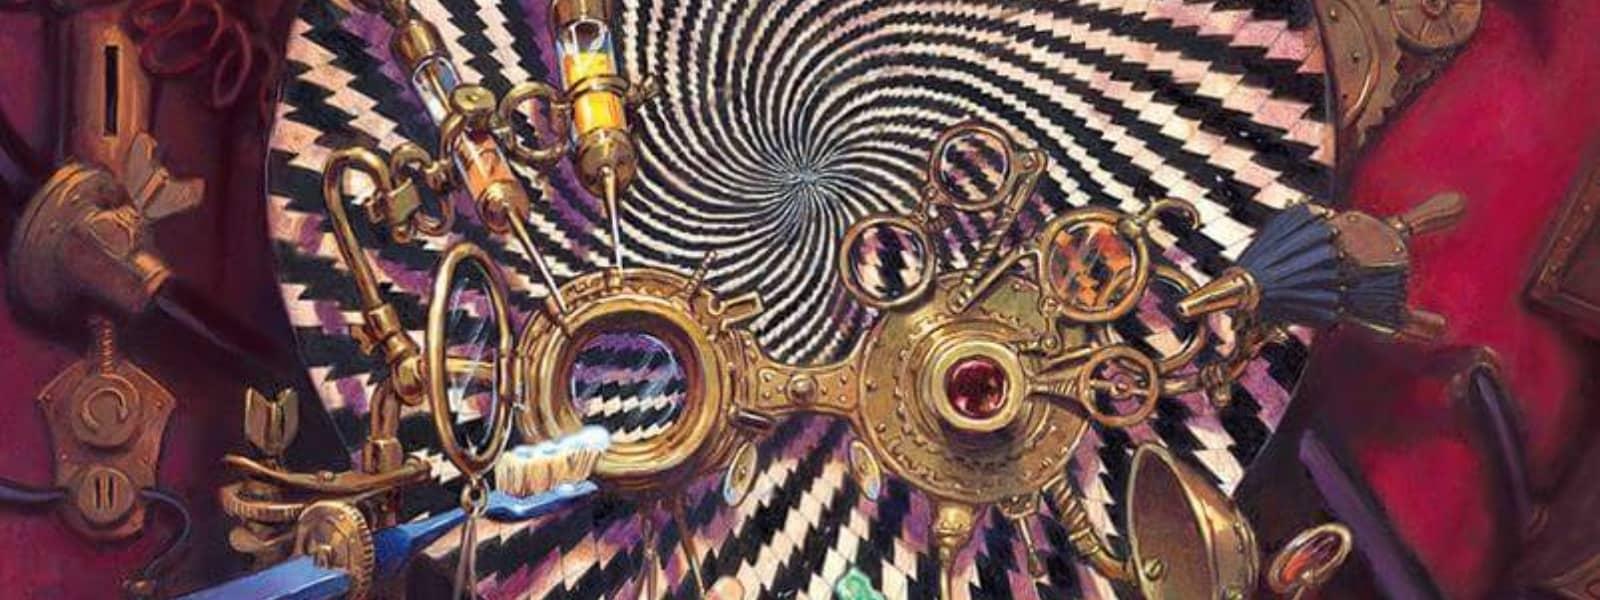 Hypnotic Swirly Disc - Hypnotic Pattern 5e